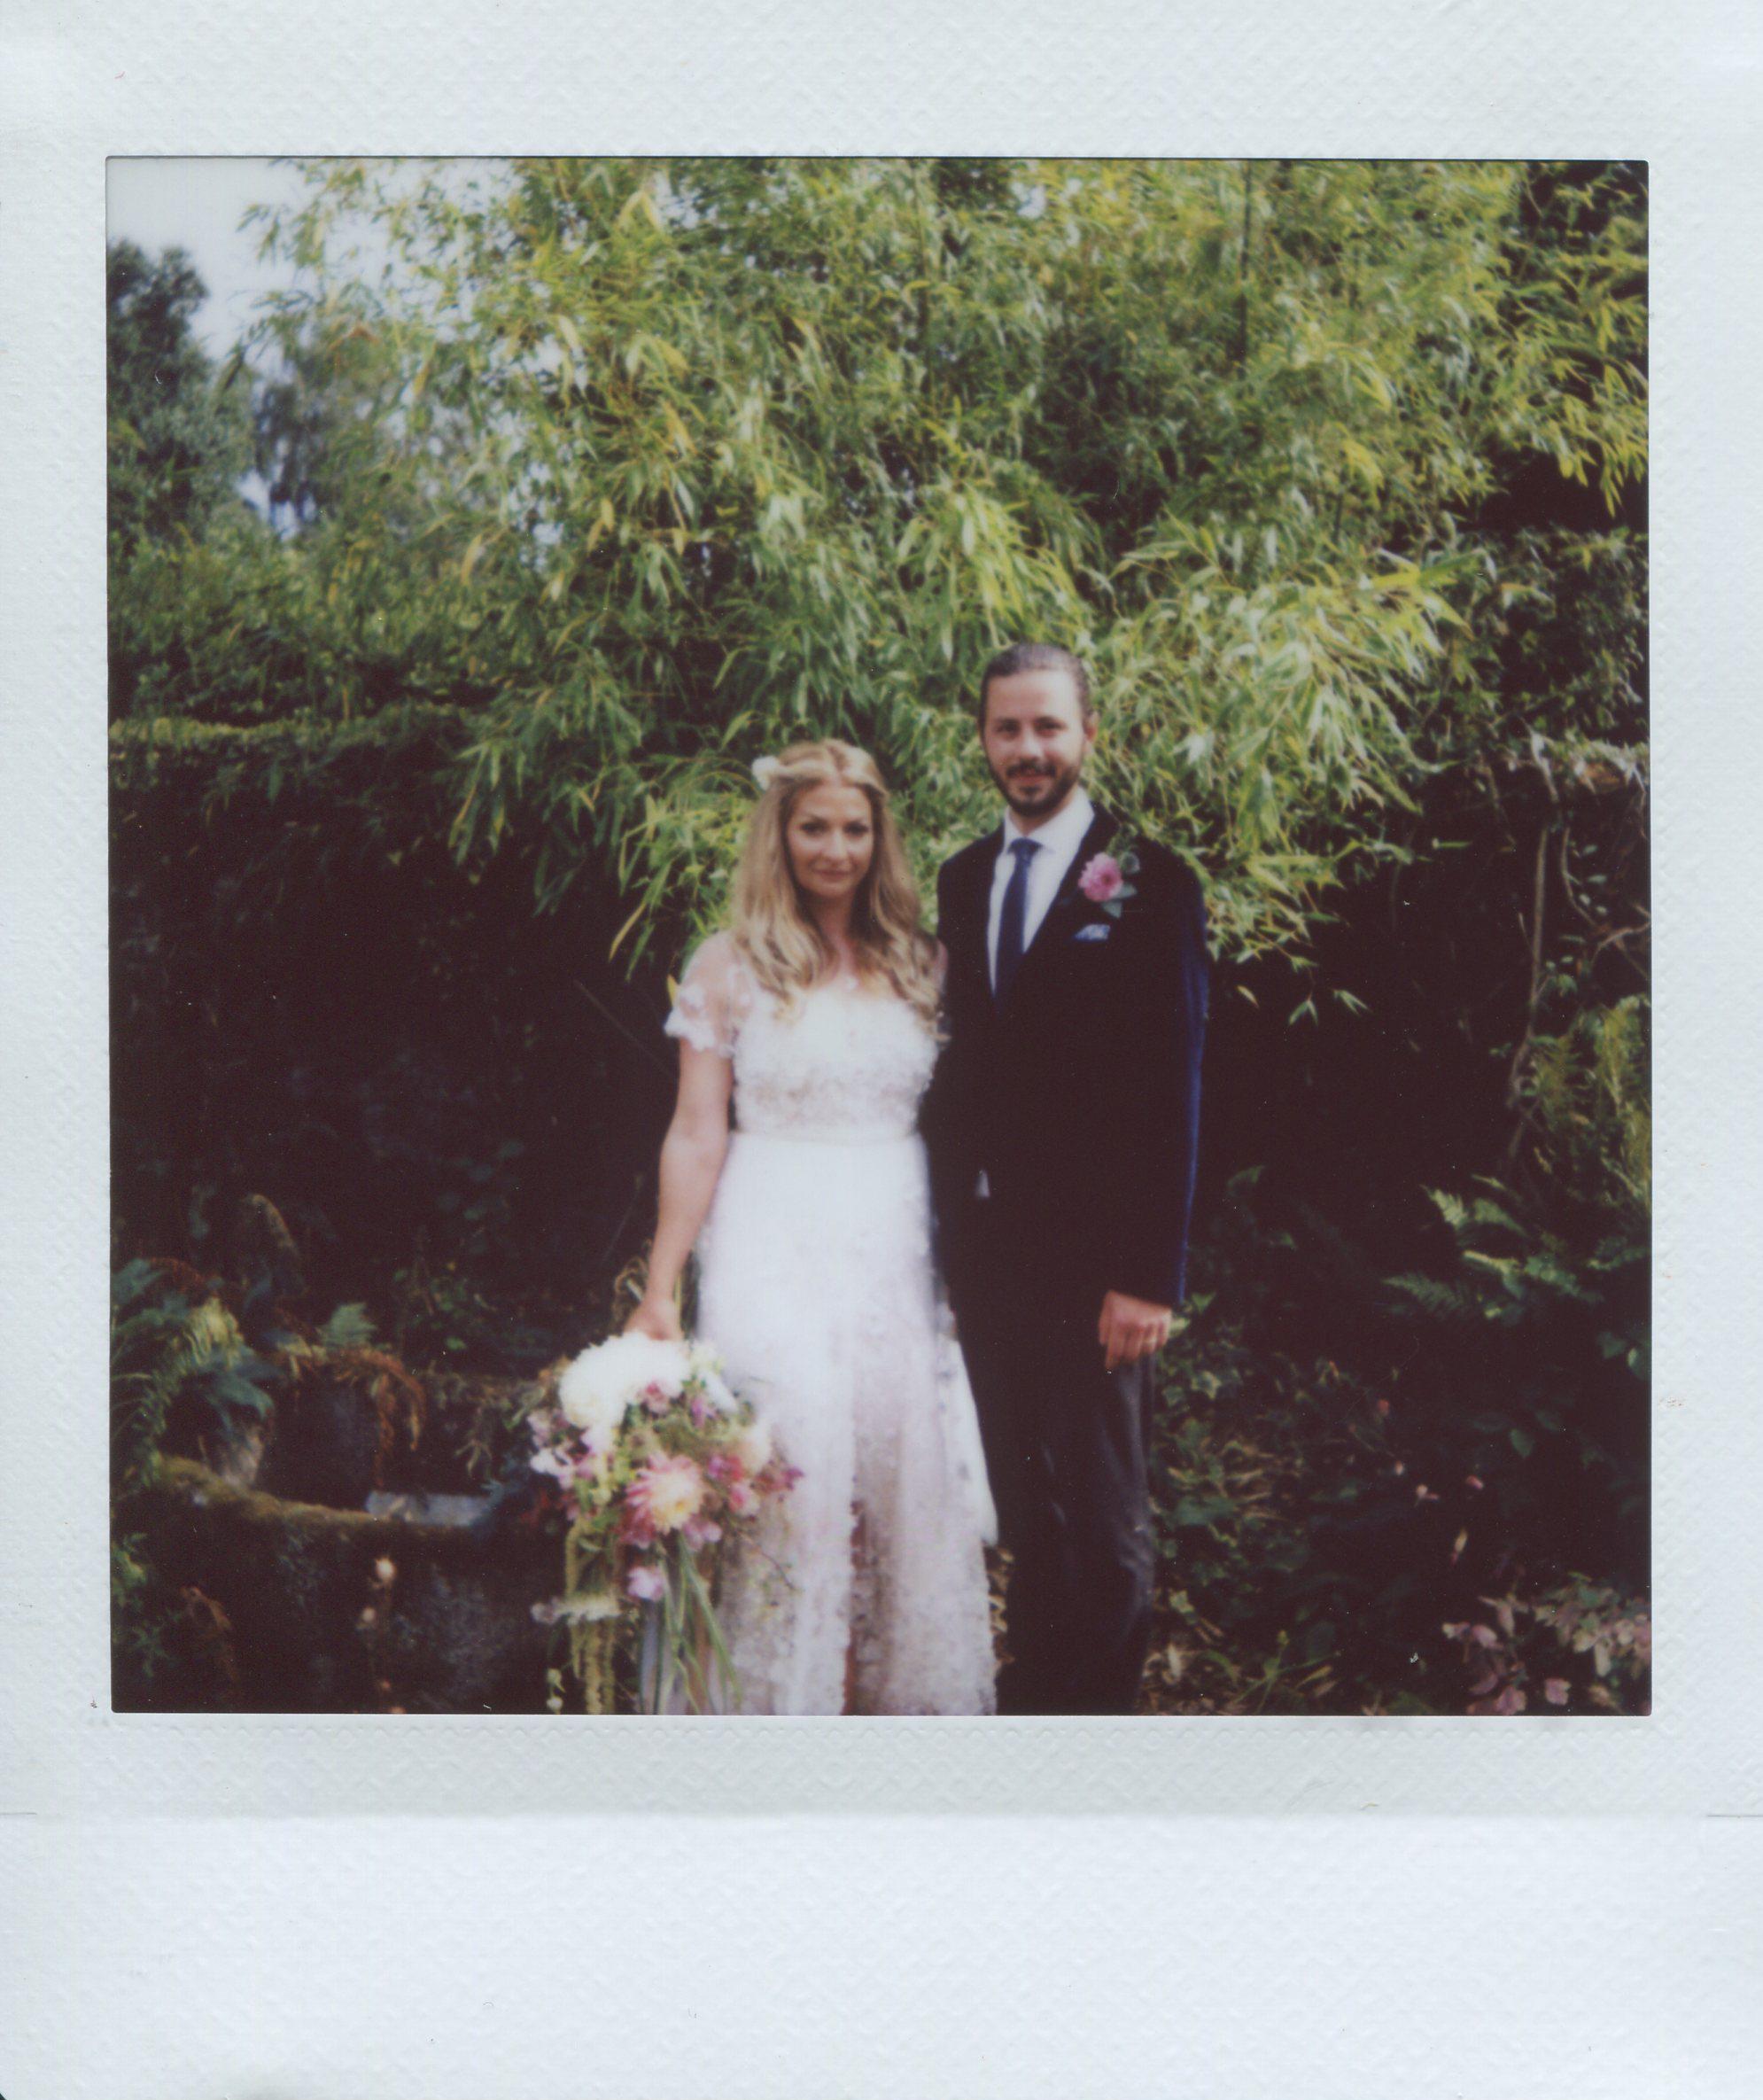 Instax square wedding